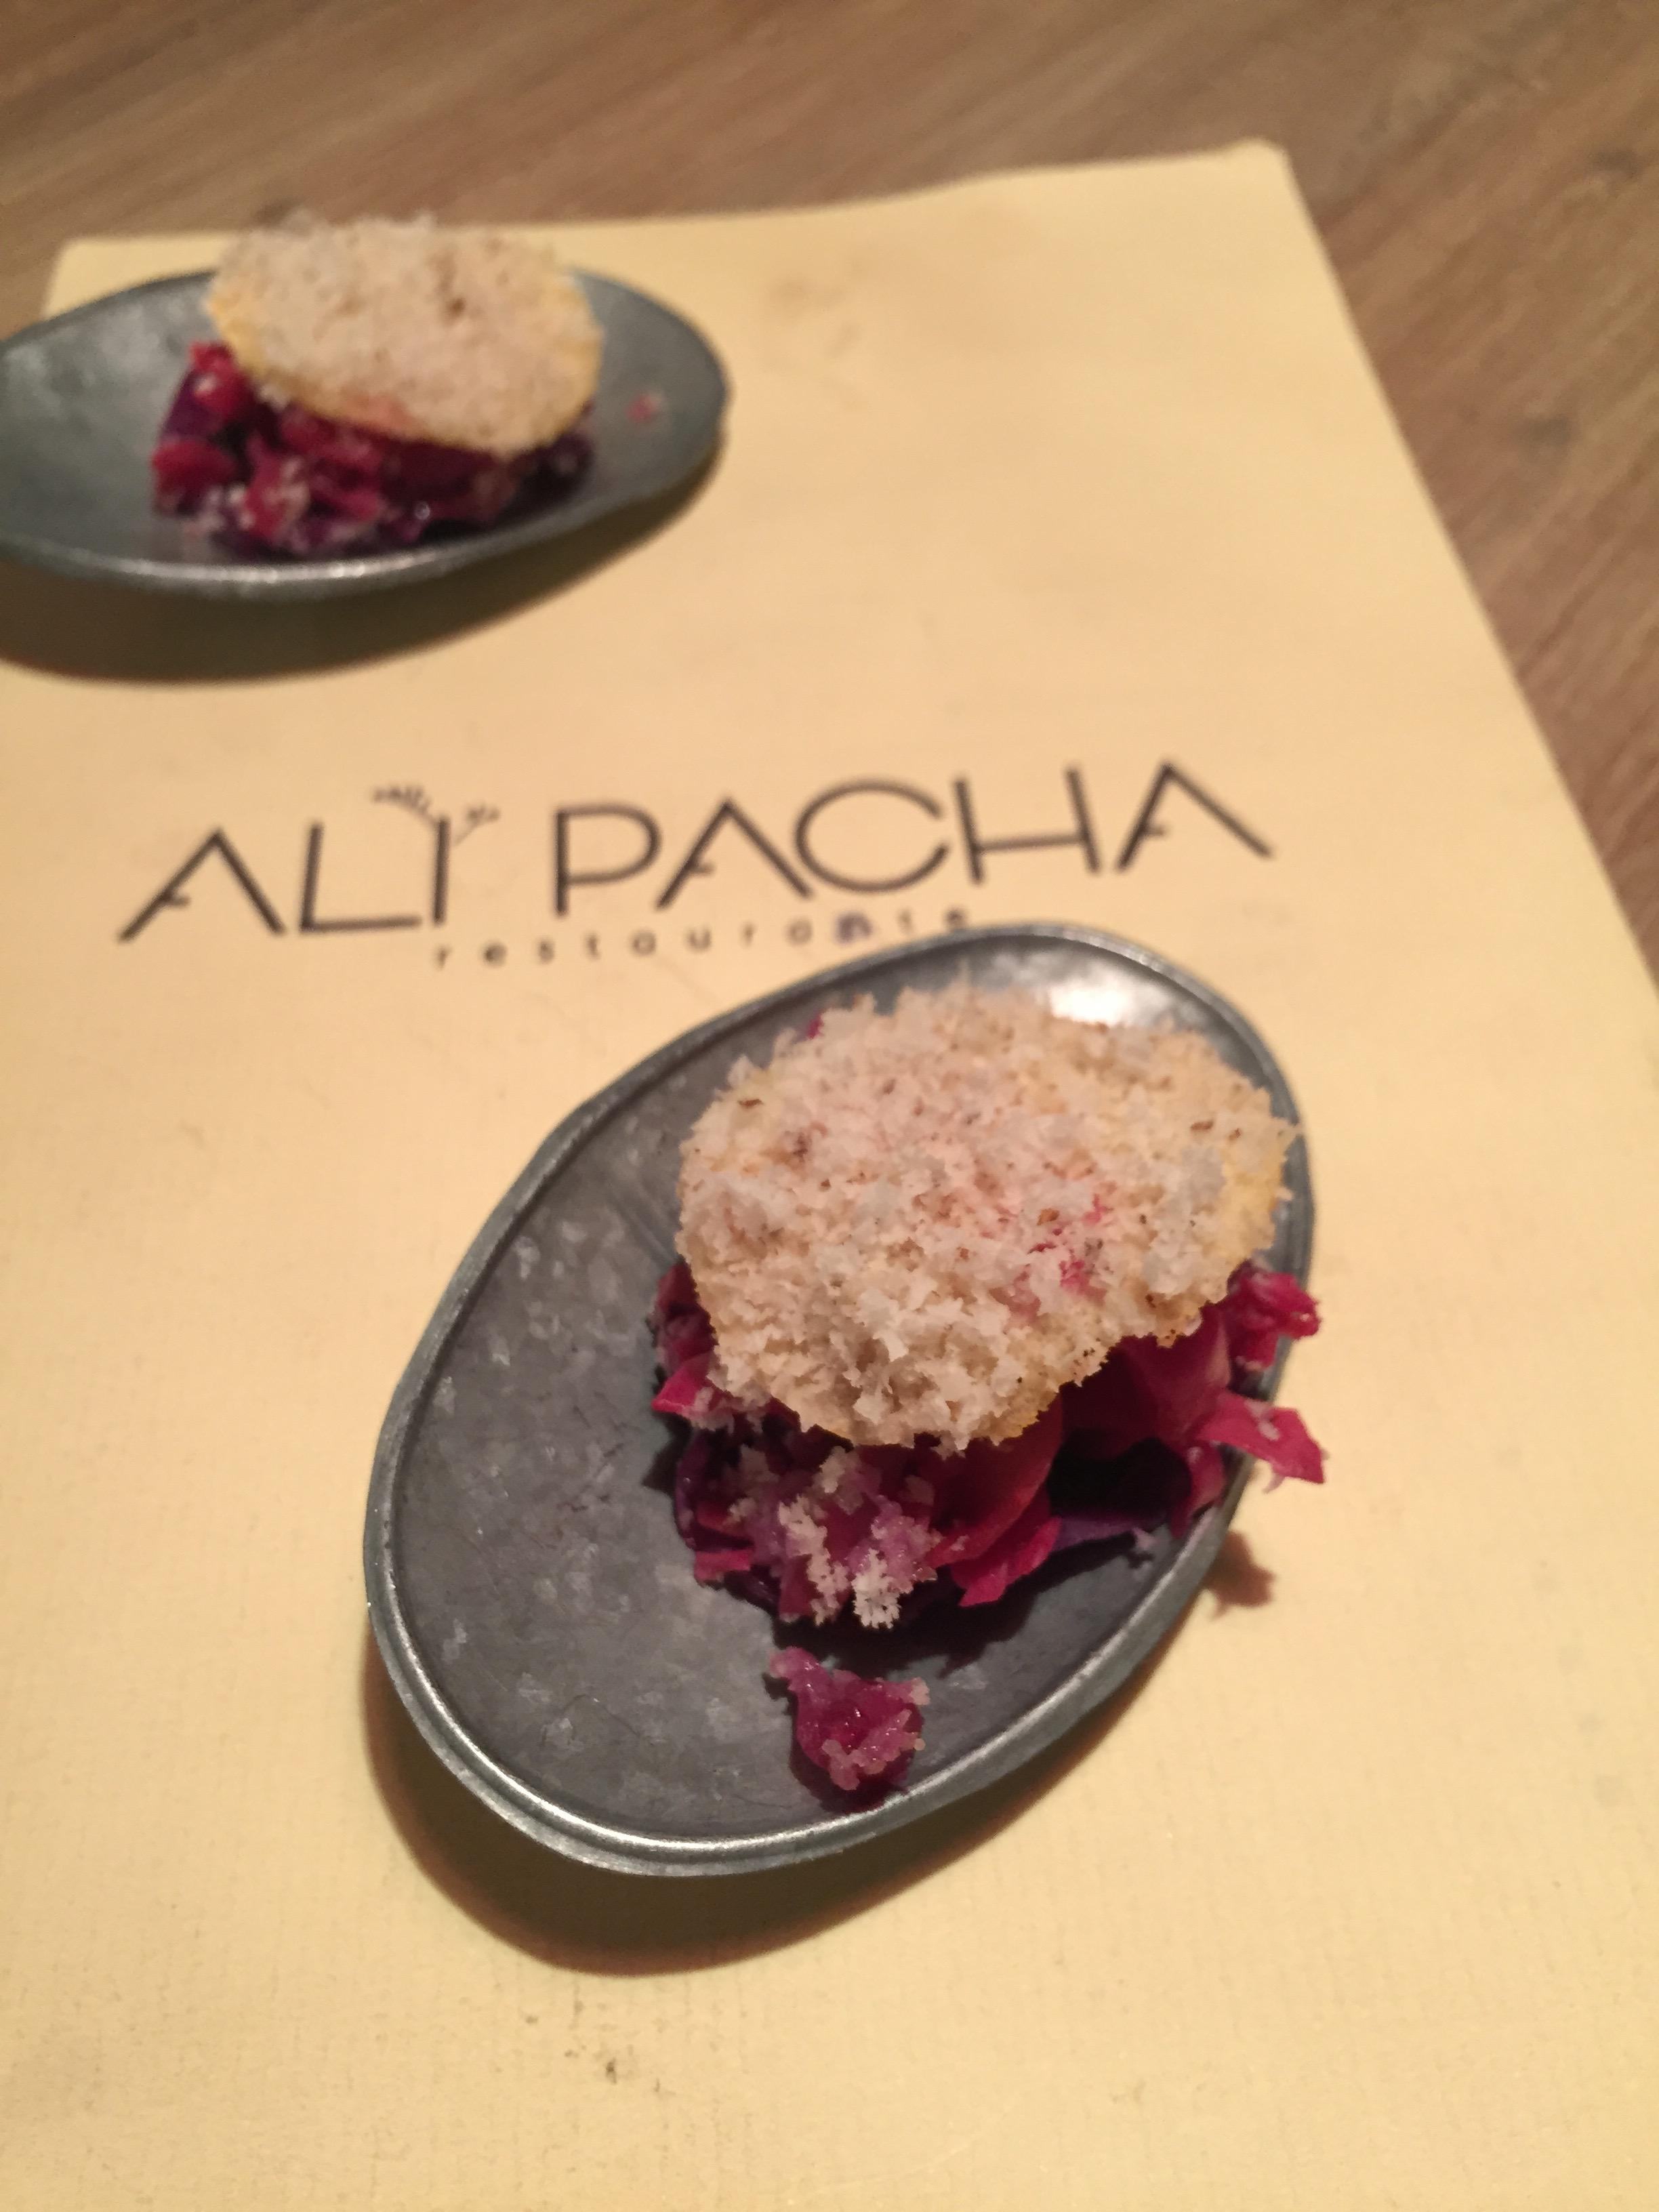 Innovative Vegan and Vegetarian Eats in La Paz from Ali Pacha